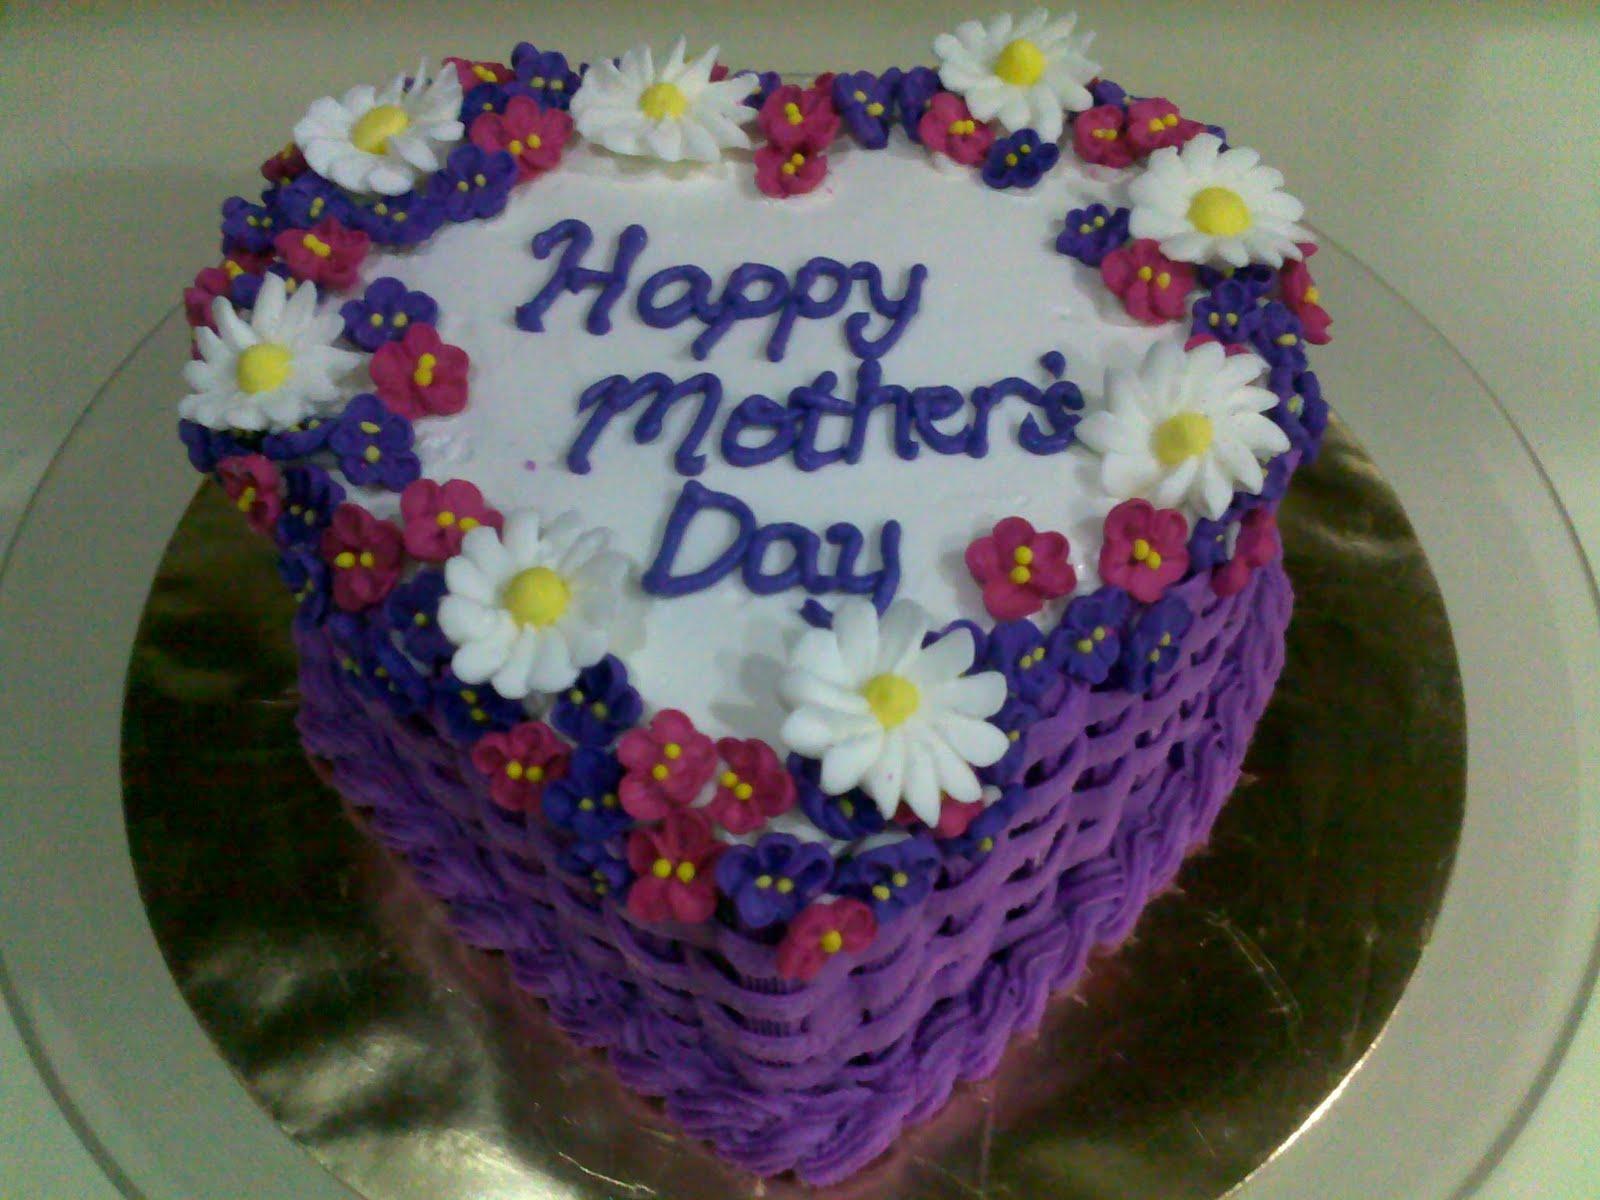 Delightful Mothers Day Cake Ideas Jareceqyk